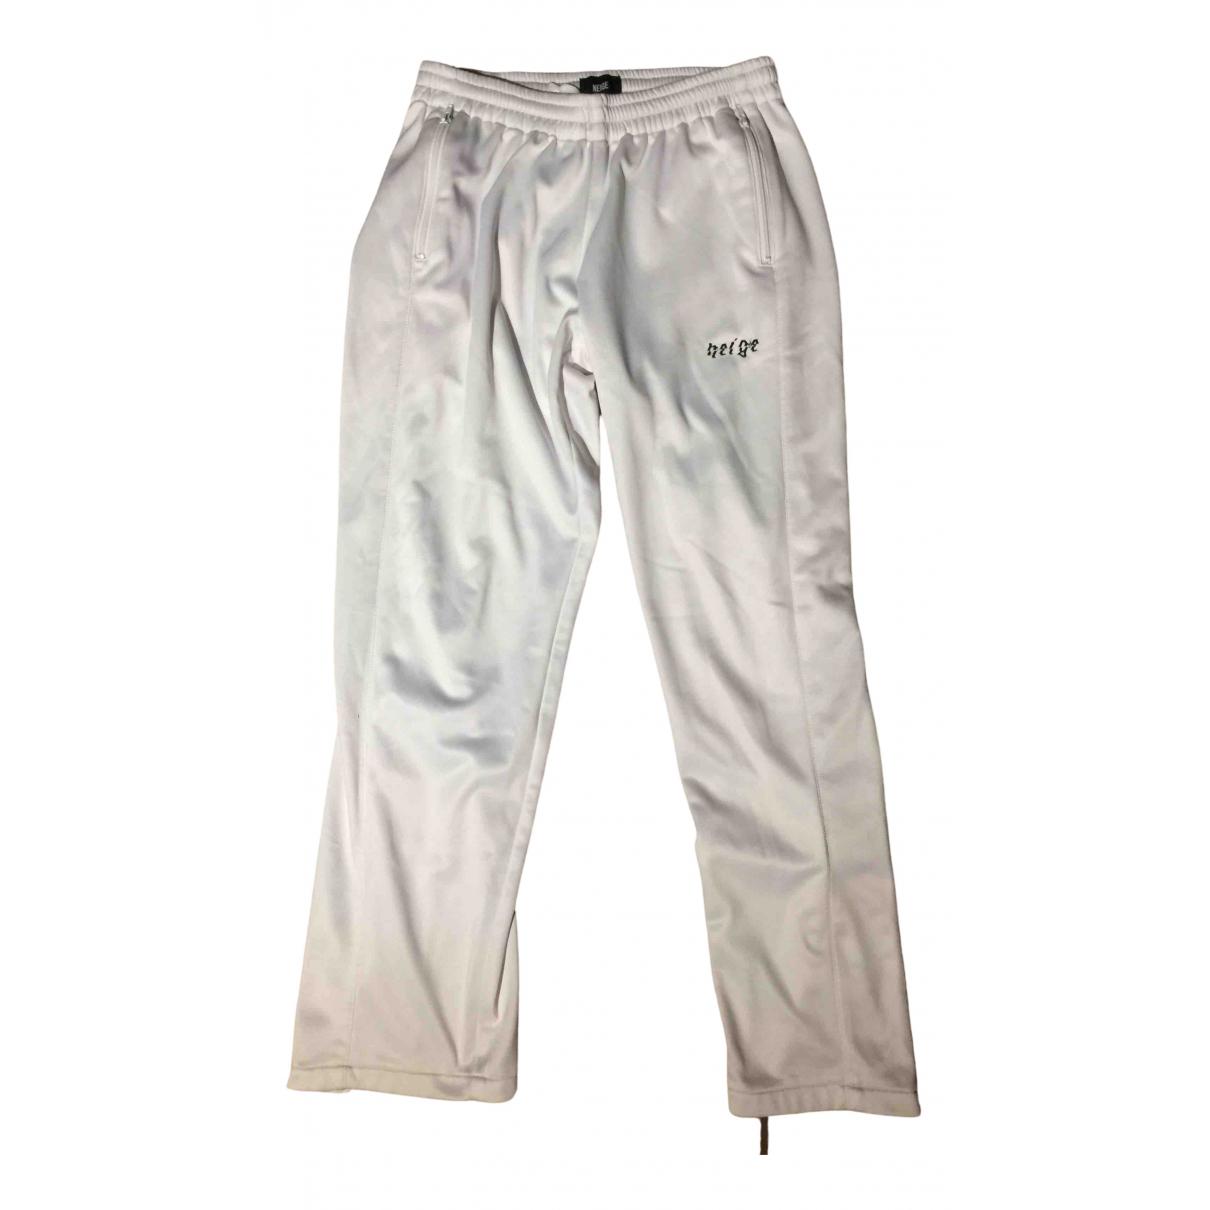 Pantalones en Algodon Blanco Non Signe / Unsigned